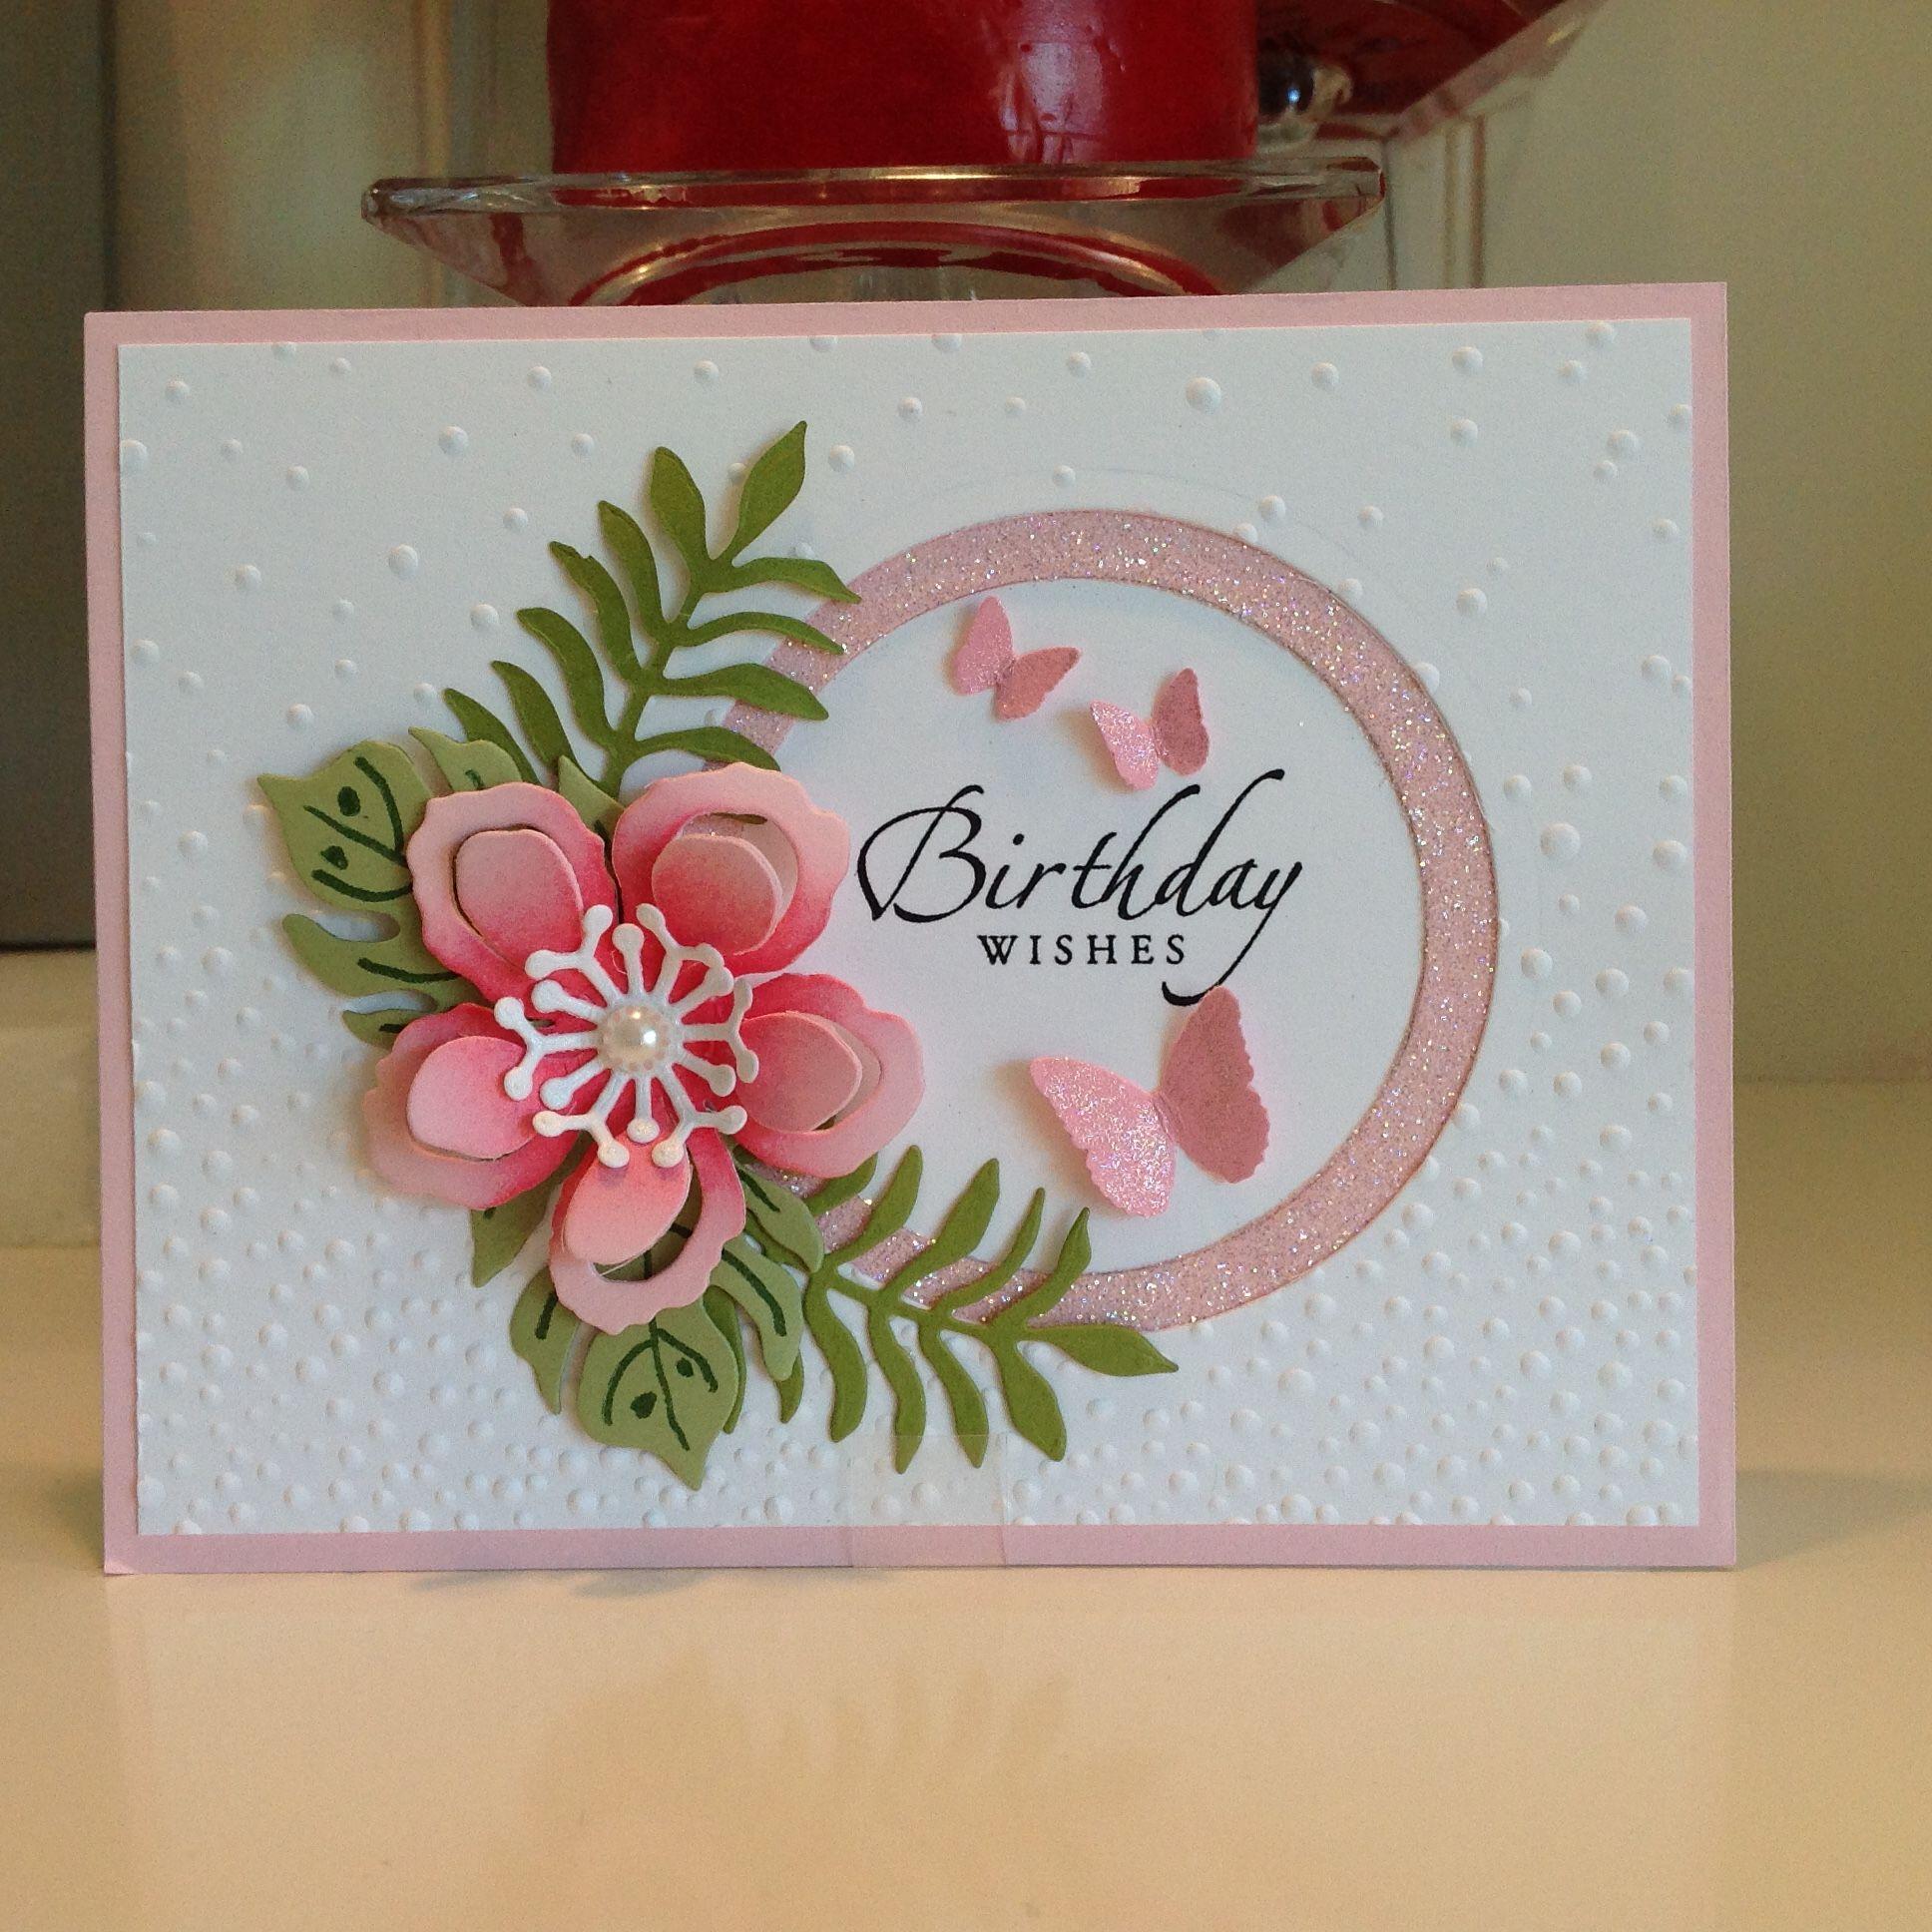 Happy Birthday card using Stampin Up Botanical Blooms